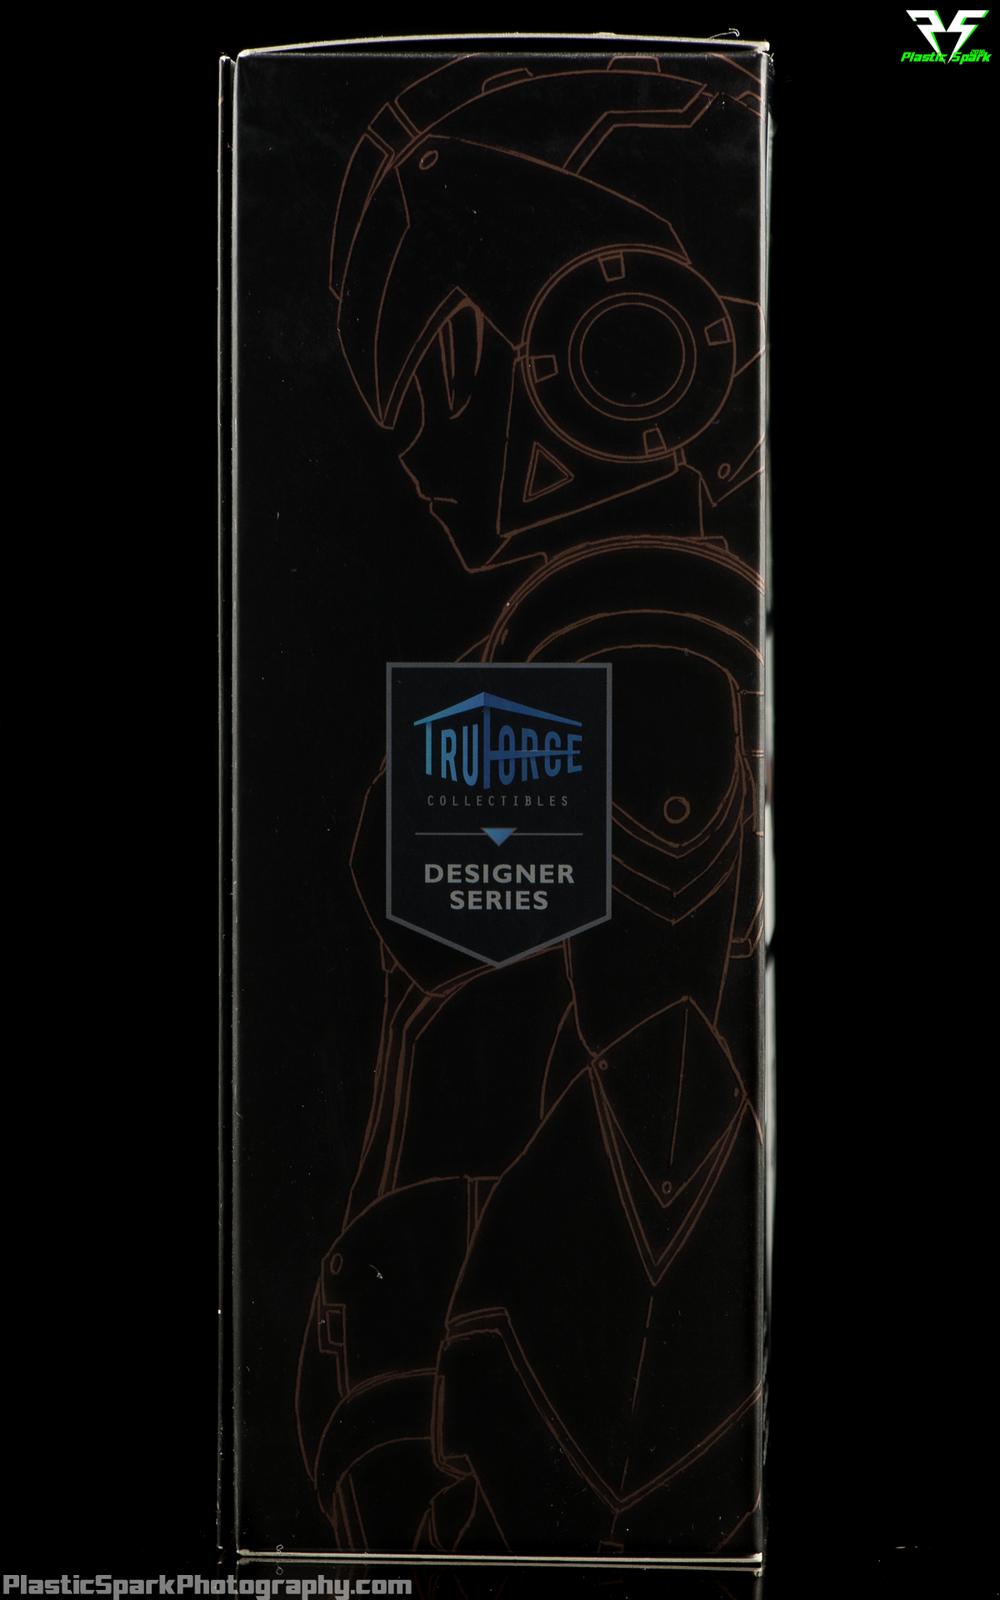 Truforce-Megaman-X-Kickstarter-Variant-Packaging-(3-of-6).png